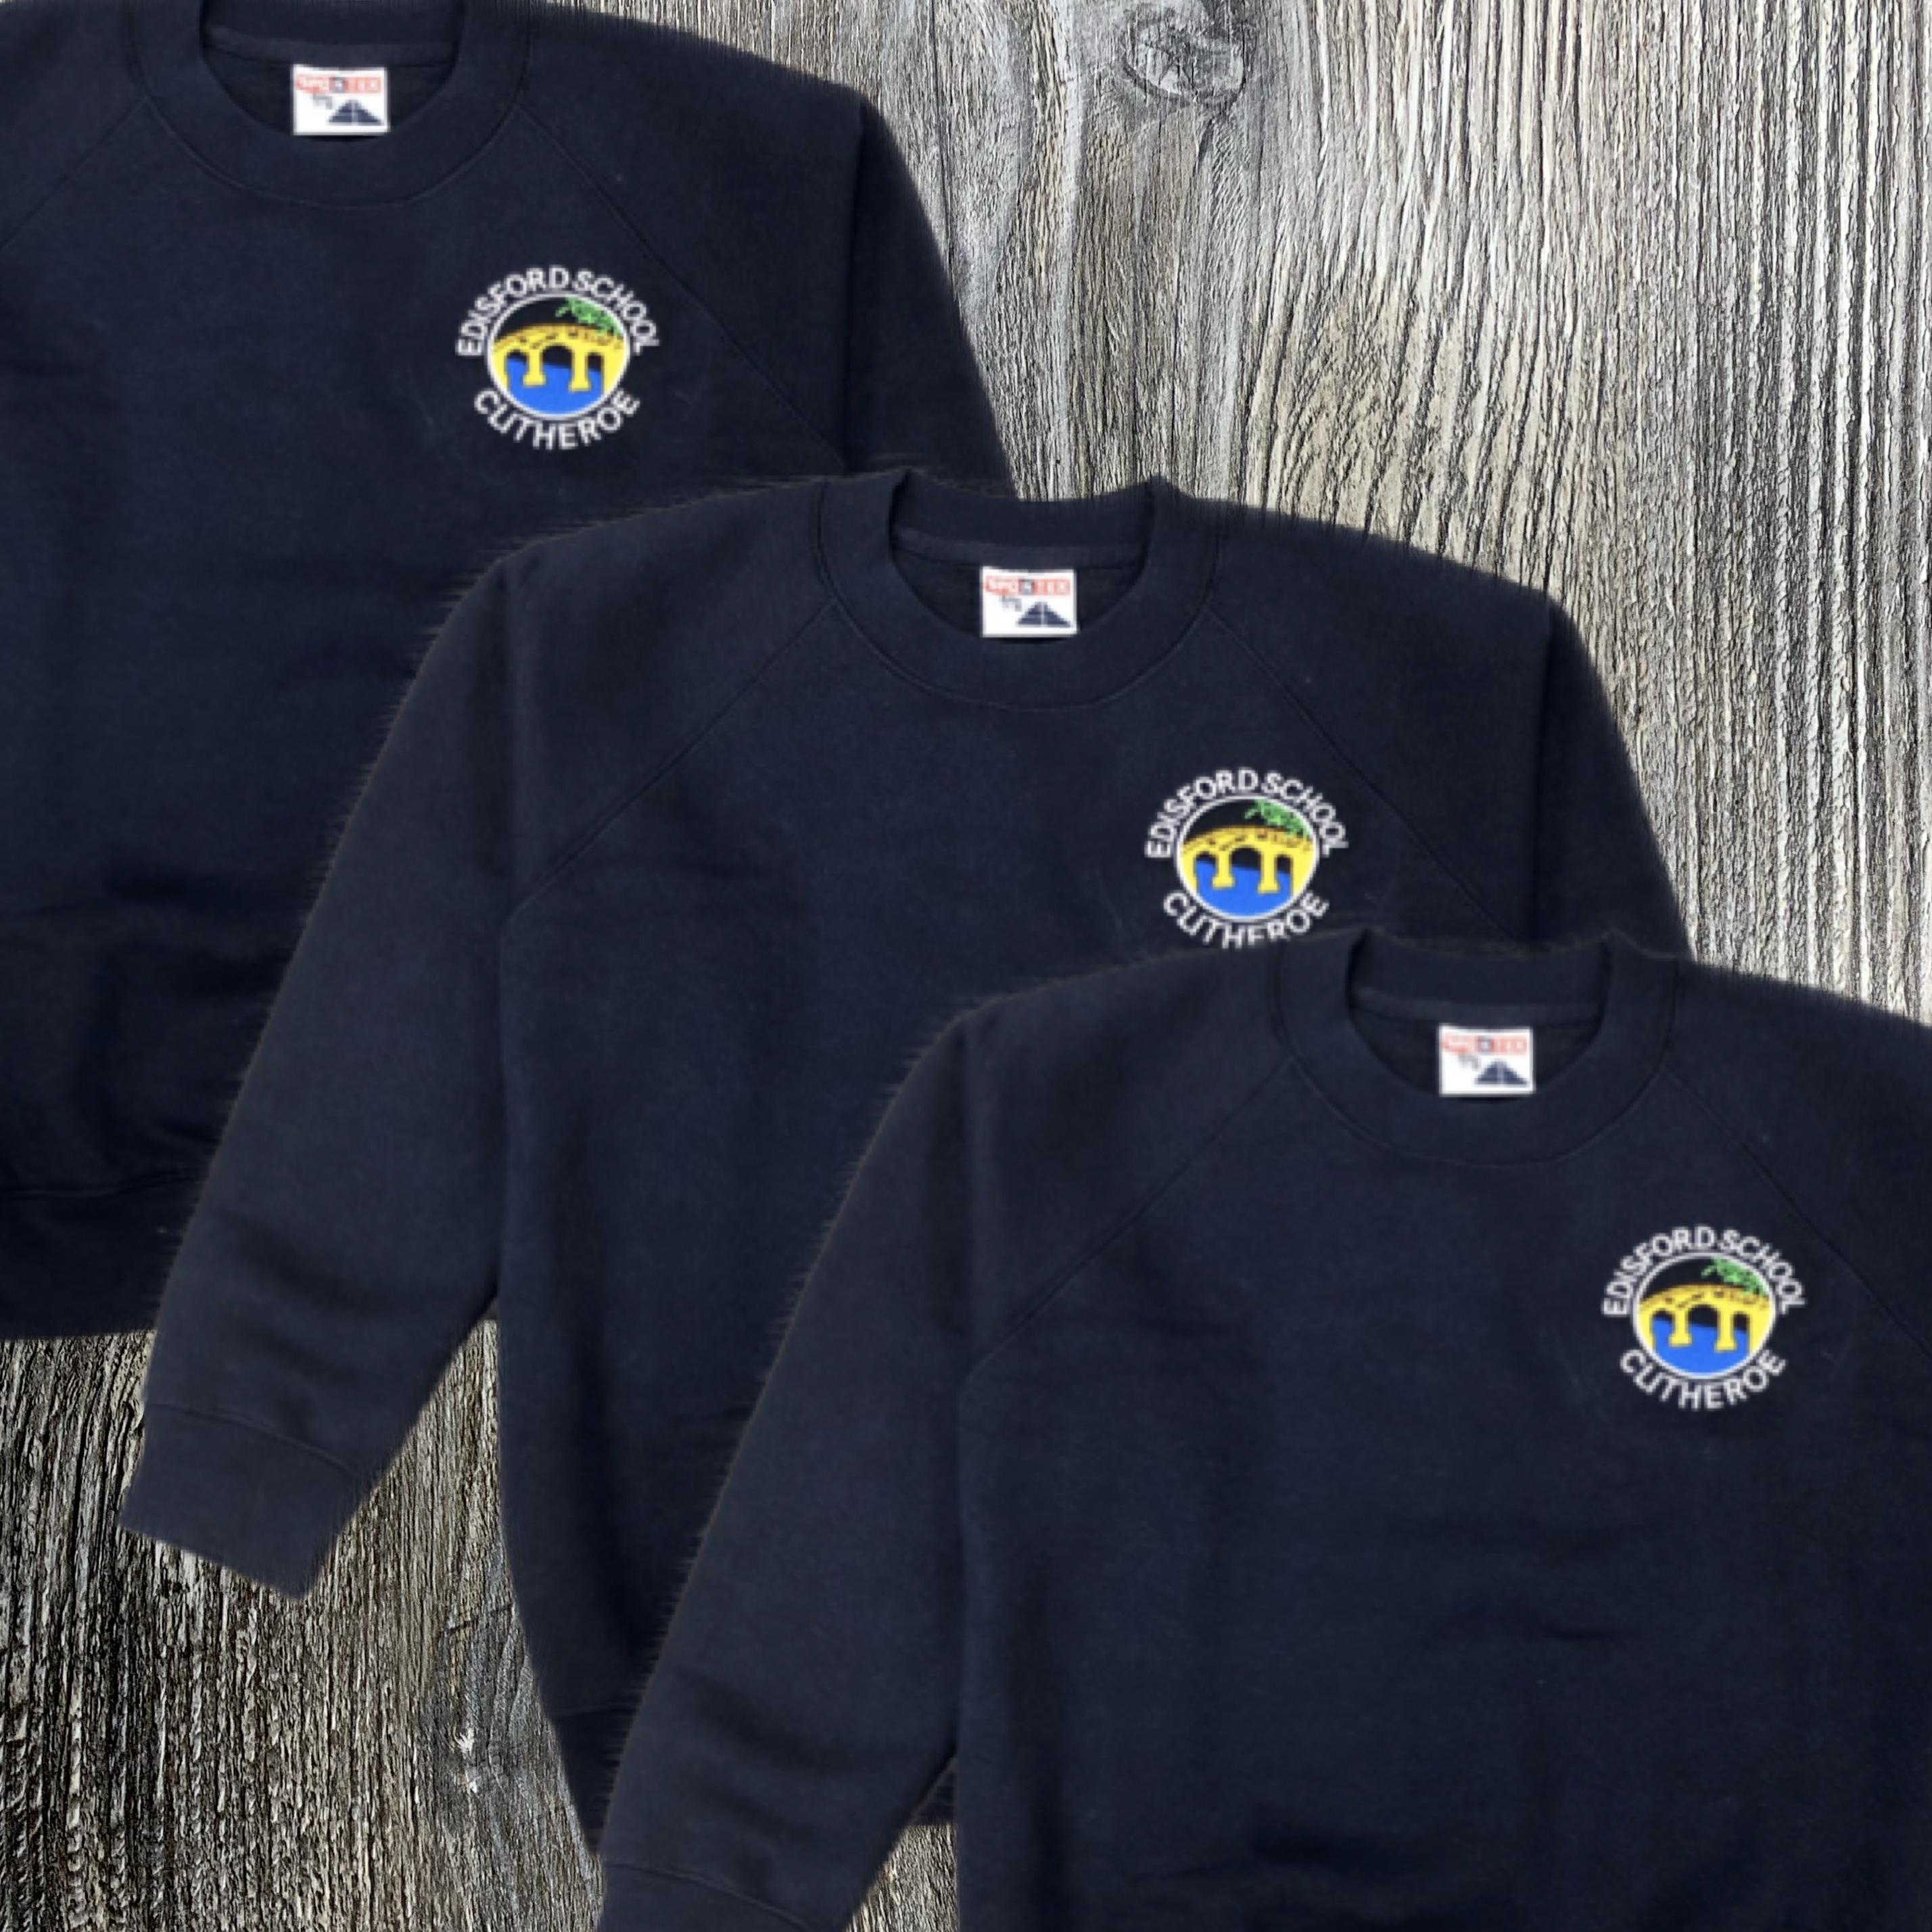 3 x Edisford Sweatshirts